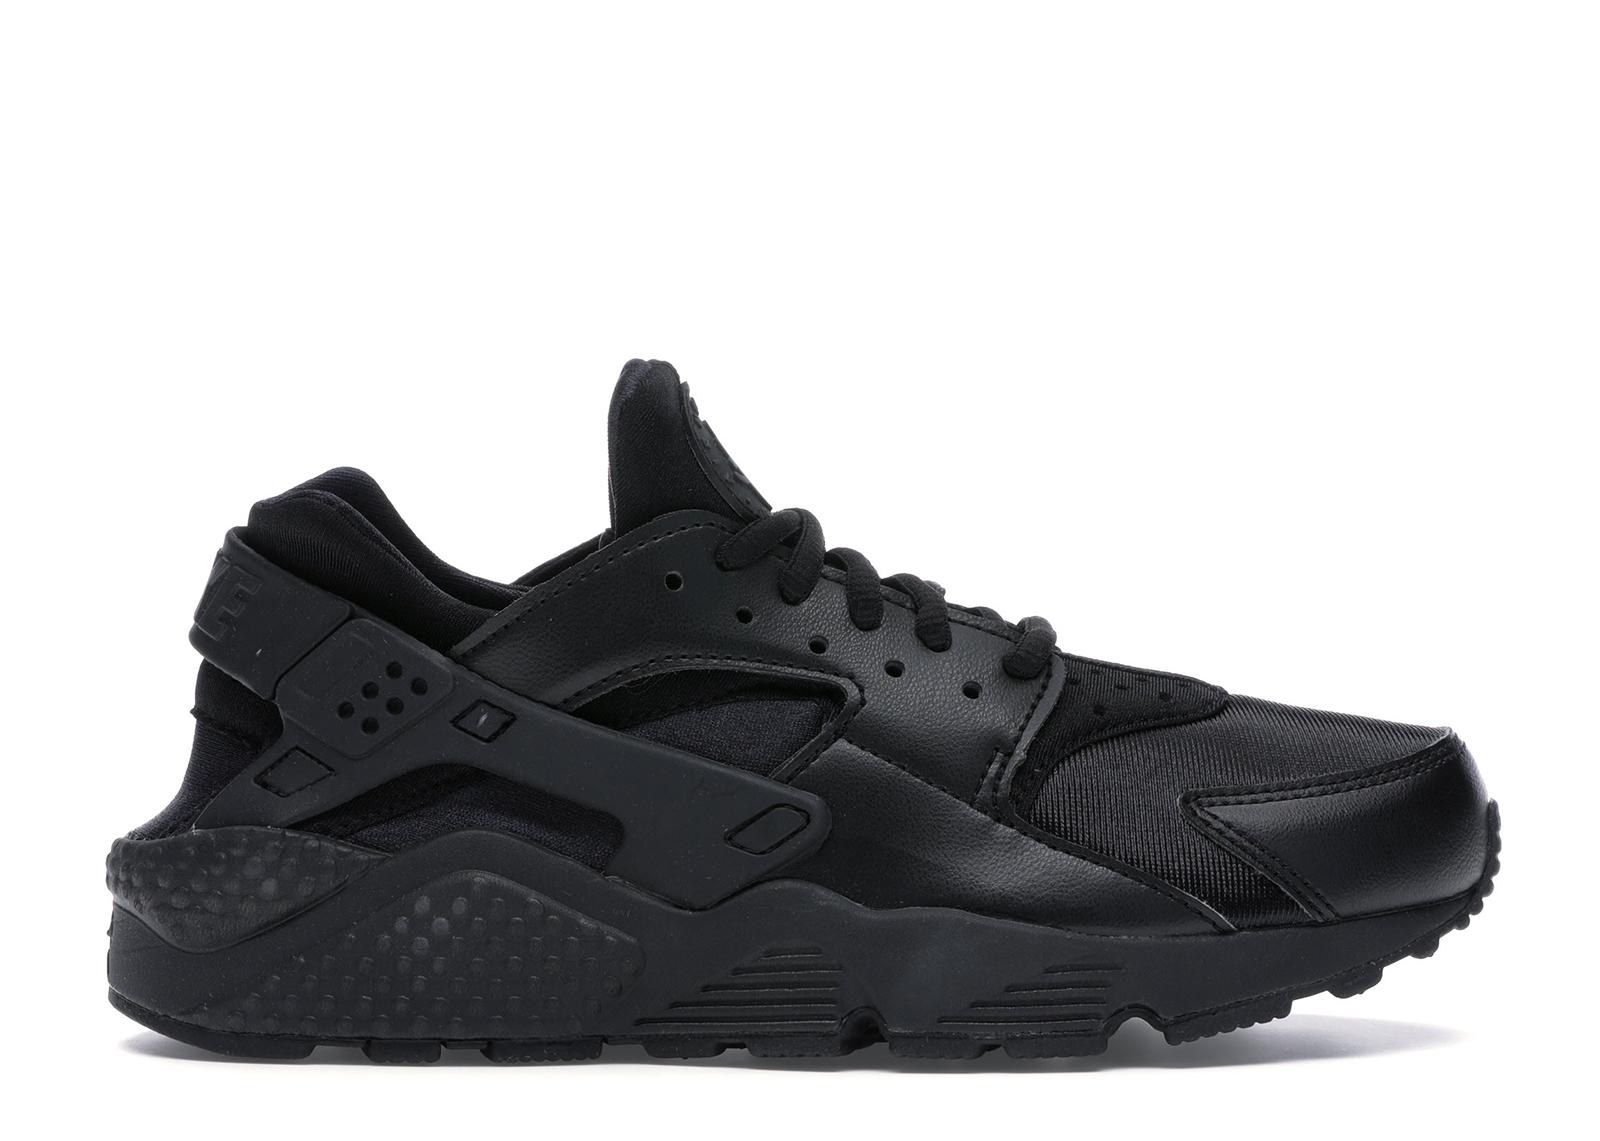 Nike Huarache Shoes \u0026 Deadstock Sneakers